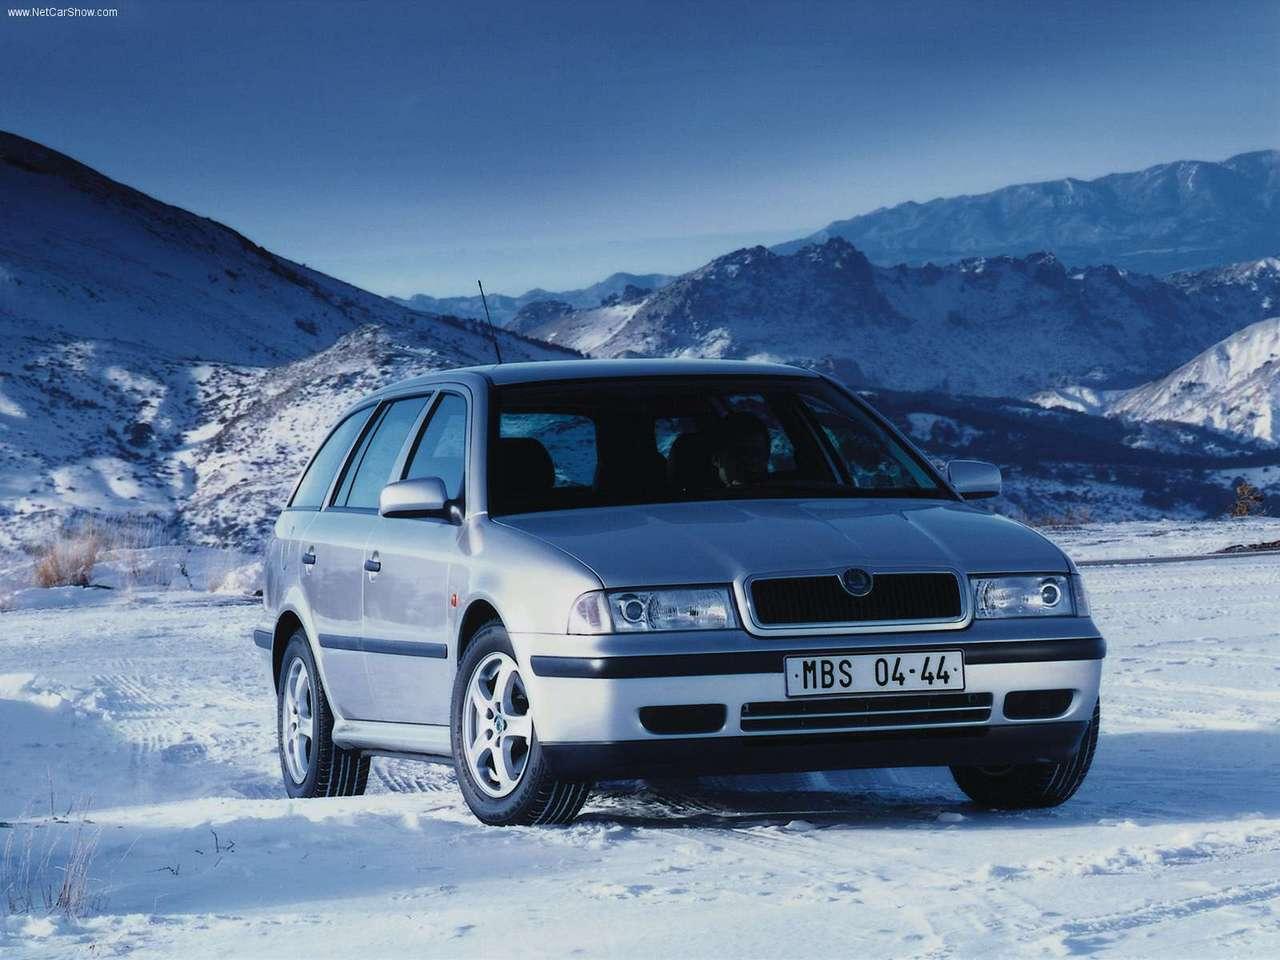 1999 skoda octavia combi 4x4 skoda cars. Black Bedroom Furniture Sets. Home Design Ideas